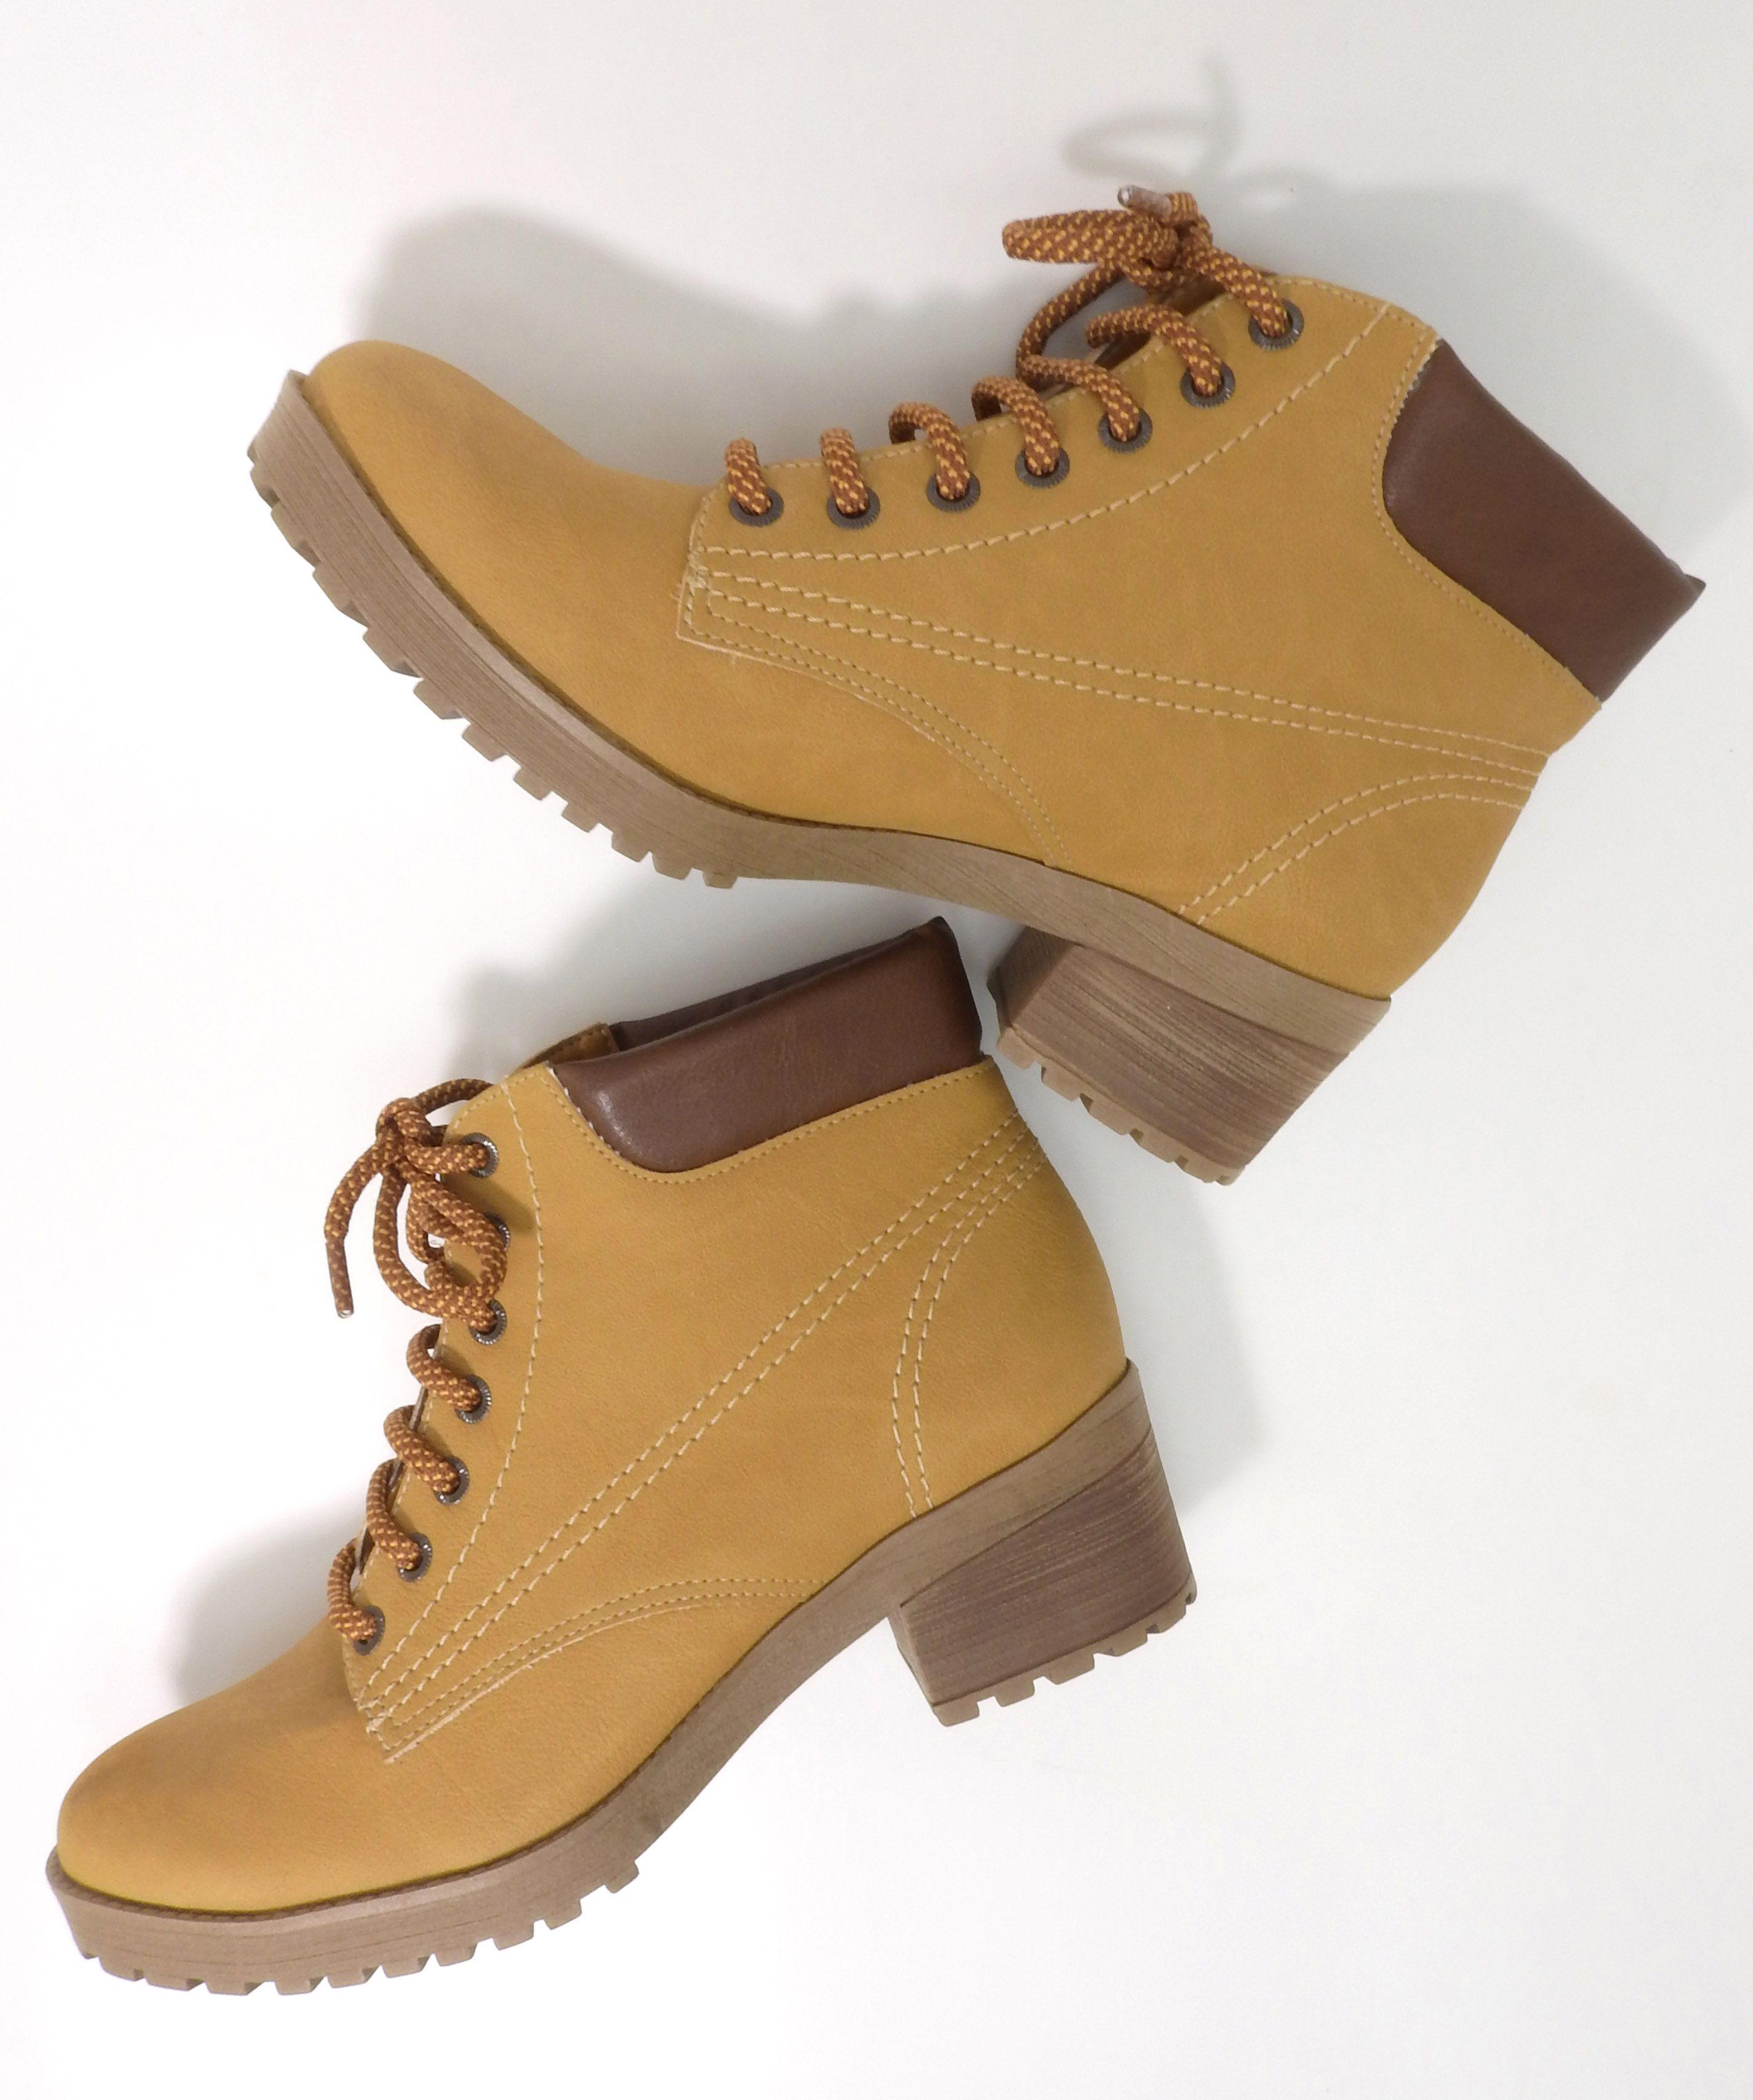 74d6267ca3 boots - botas - coturnos - winter - Inverno 2016 - Ref. 16-4906 ...